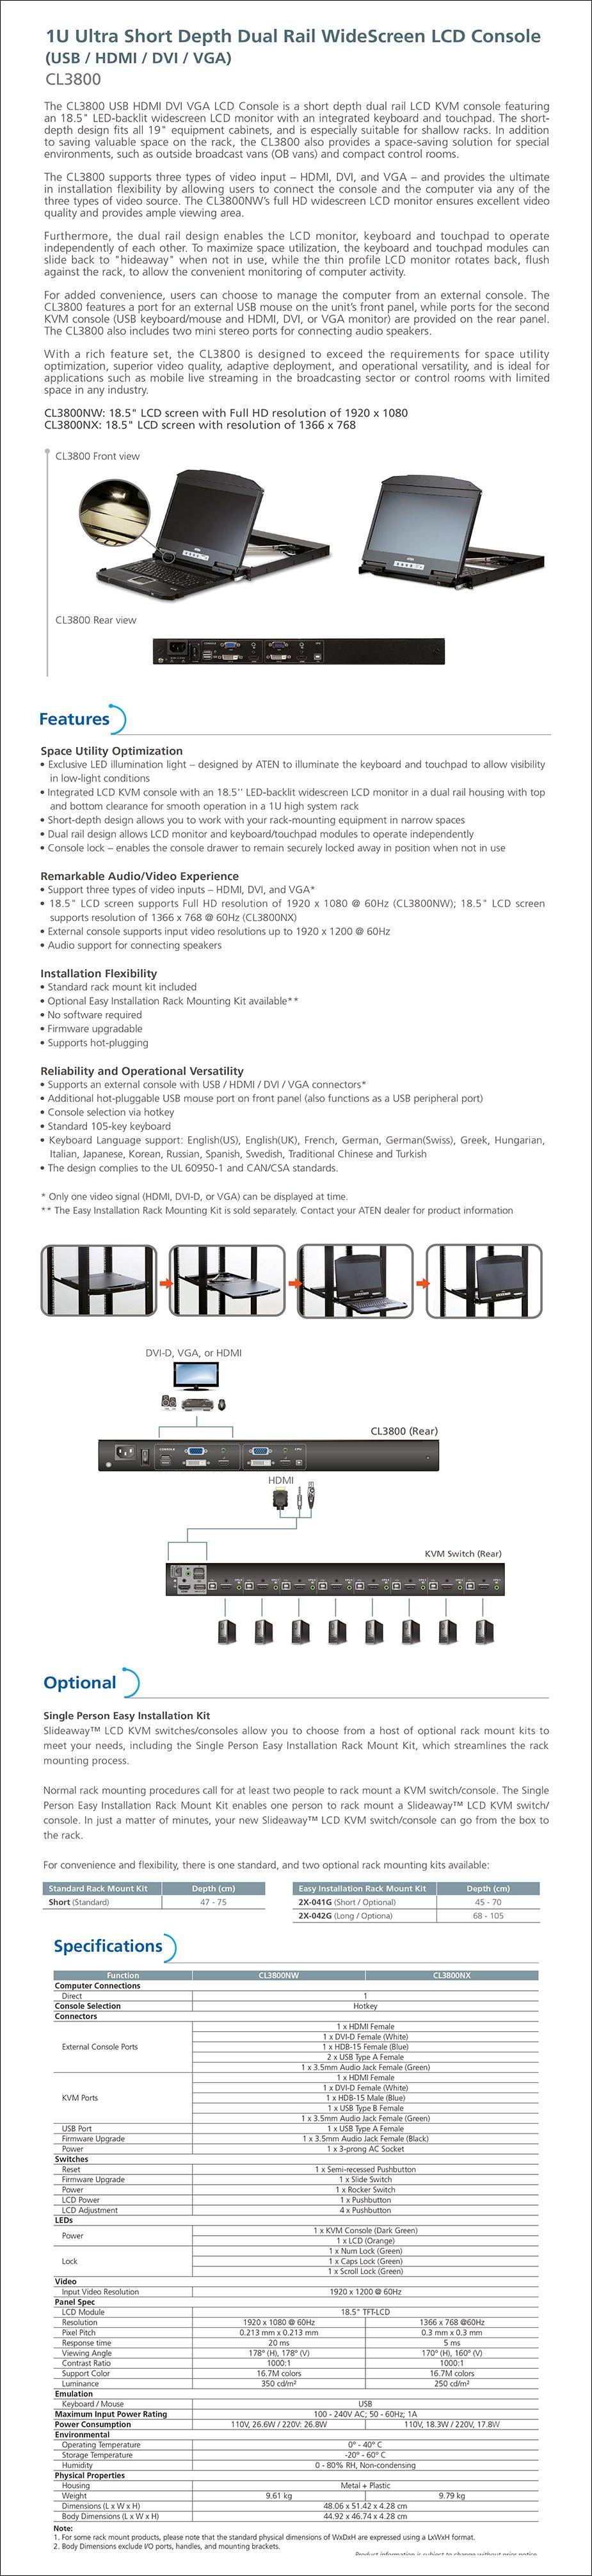 aten-cl3800-185-hd-1u-ultra-short-depth-dual-rail-widescreen-lcd-console-ac28289-7.jpg